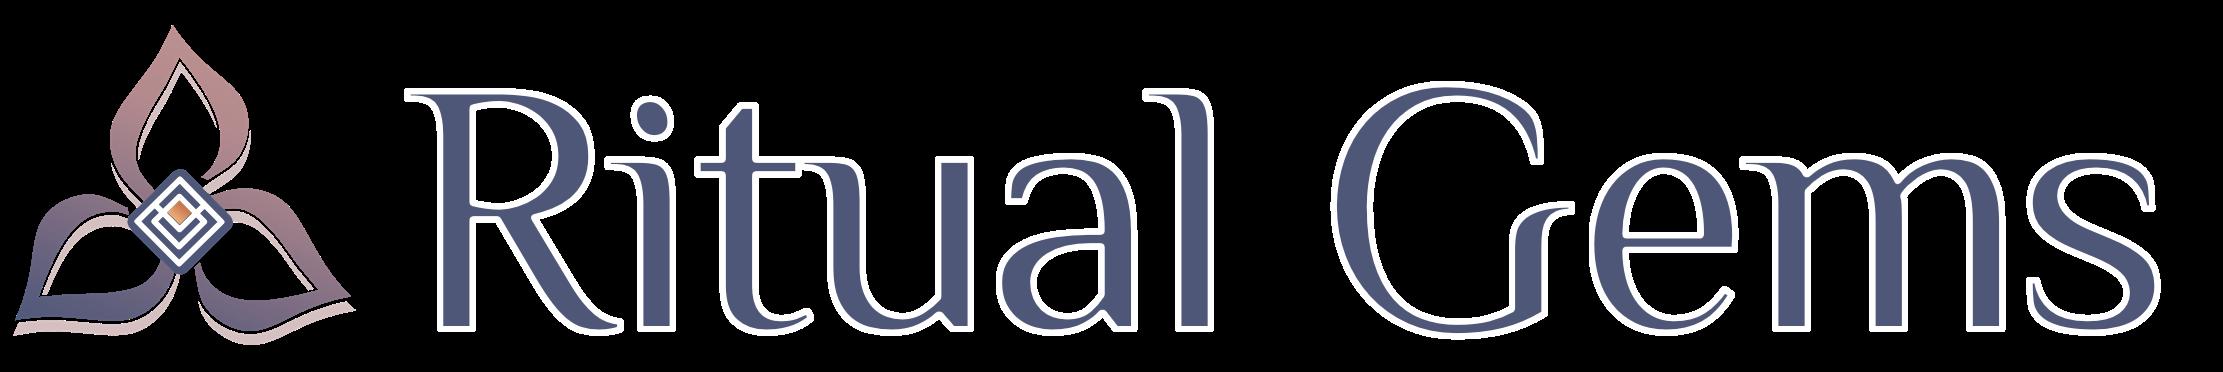 Ritual Gems